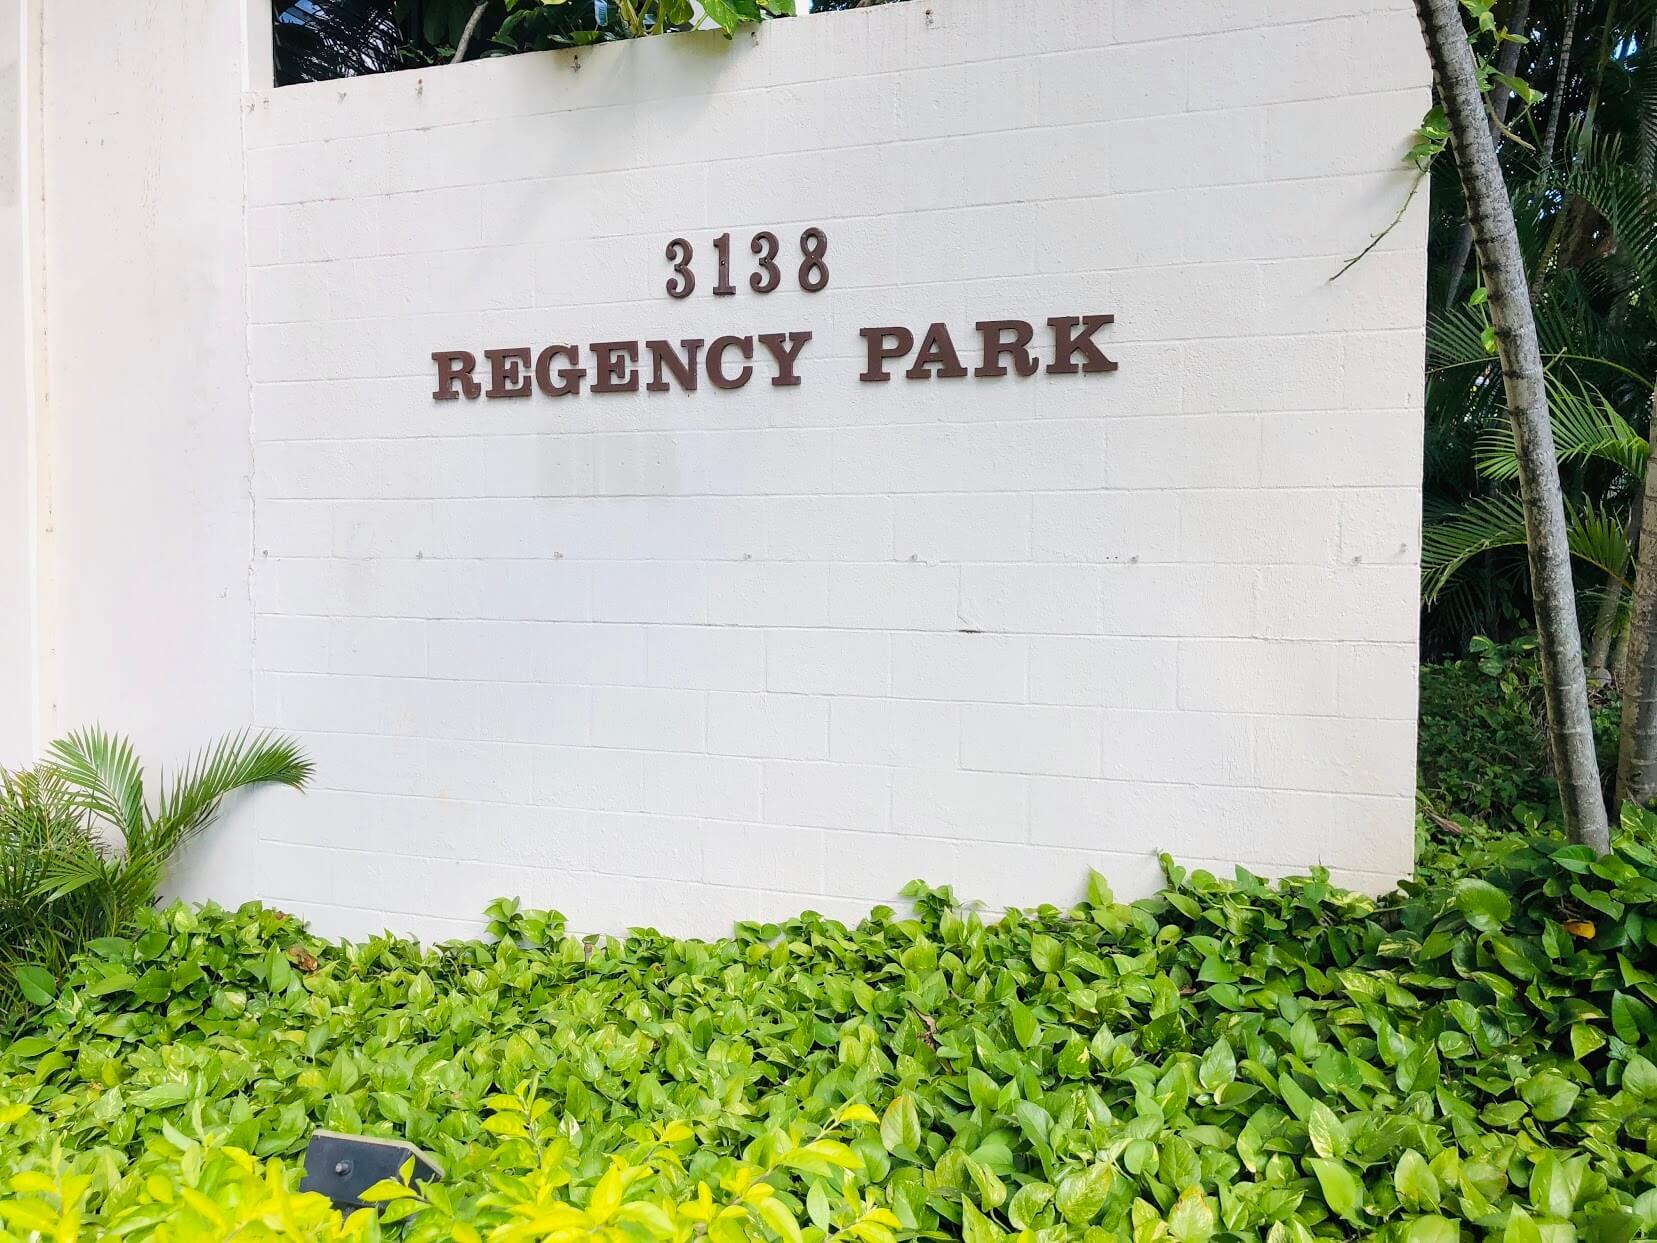 Regency Parkの看板